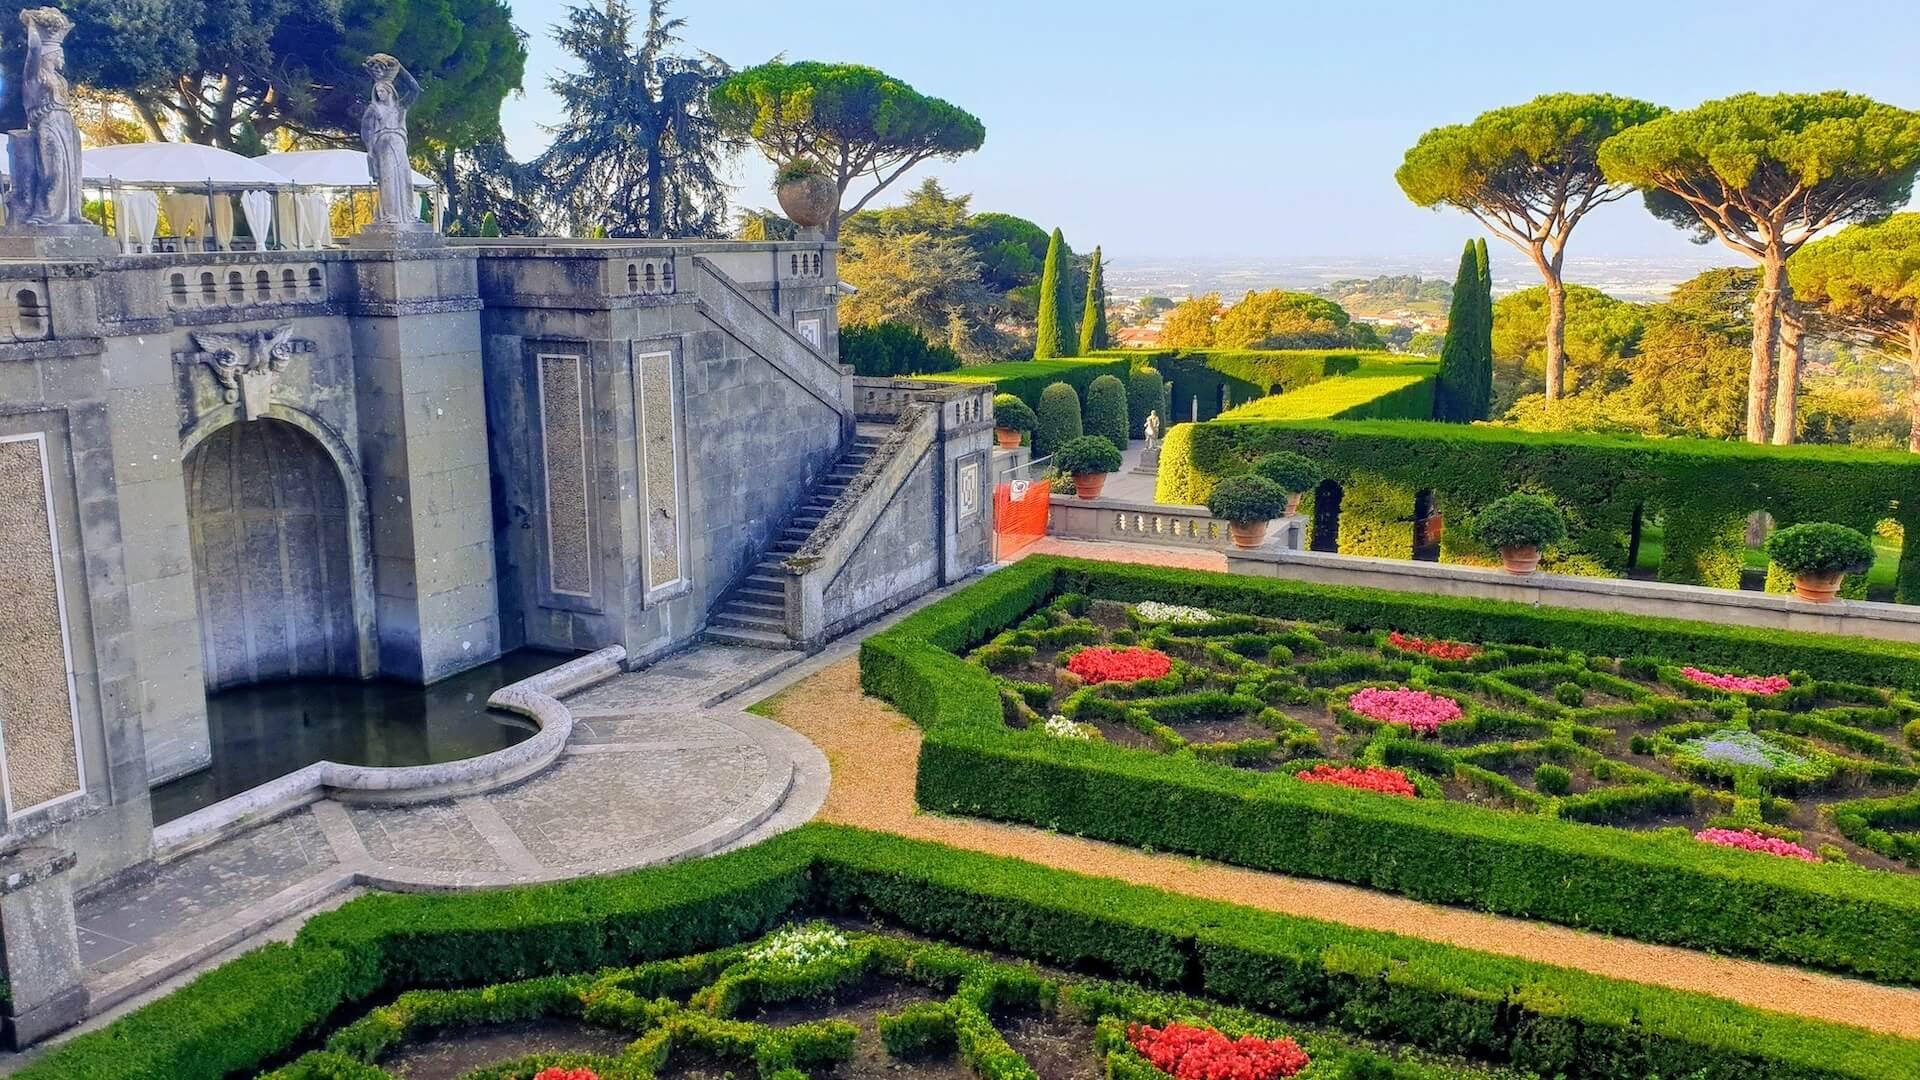 Castel Gandolfo Baberini Gardens